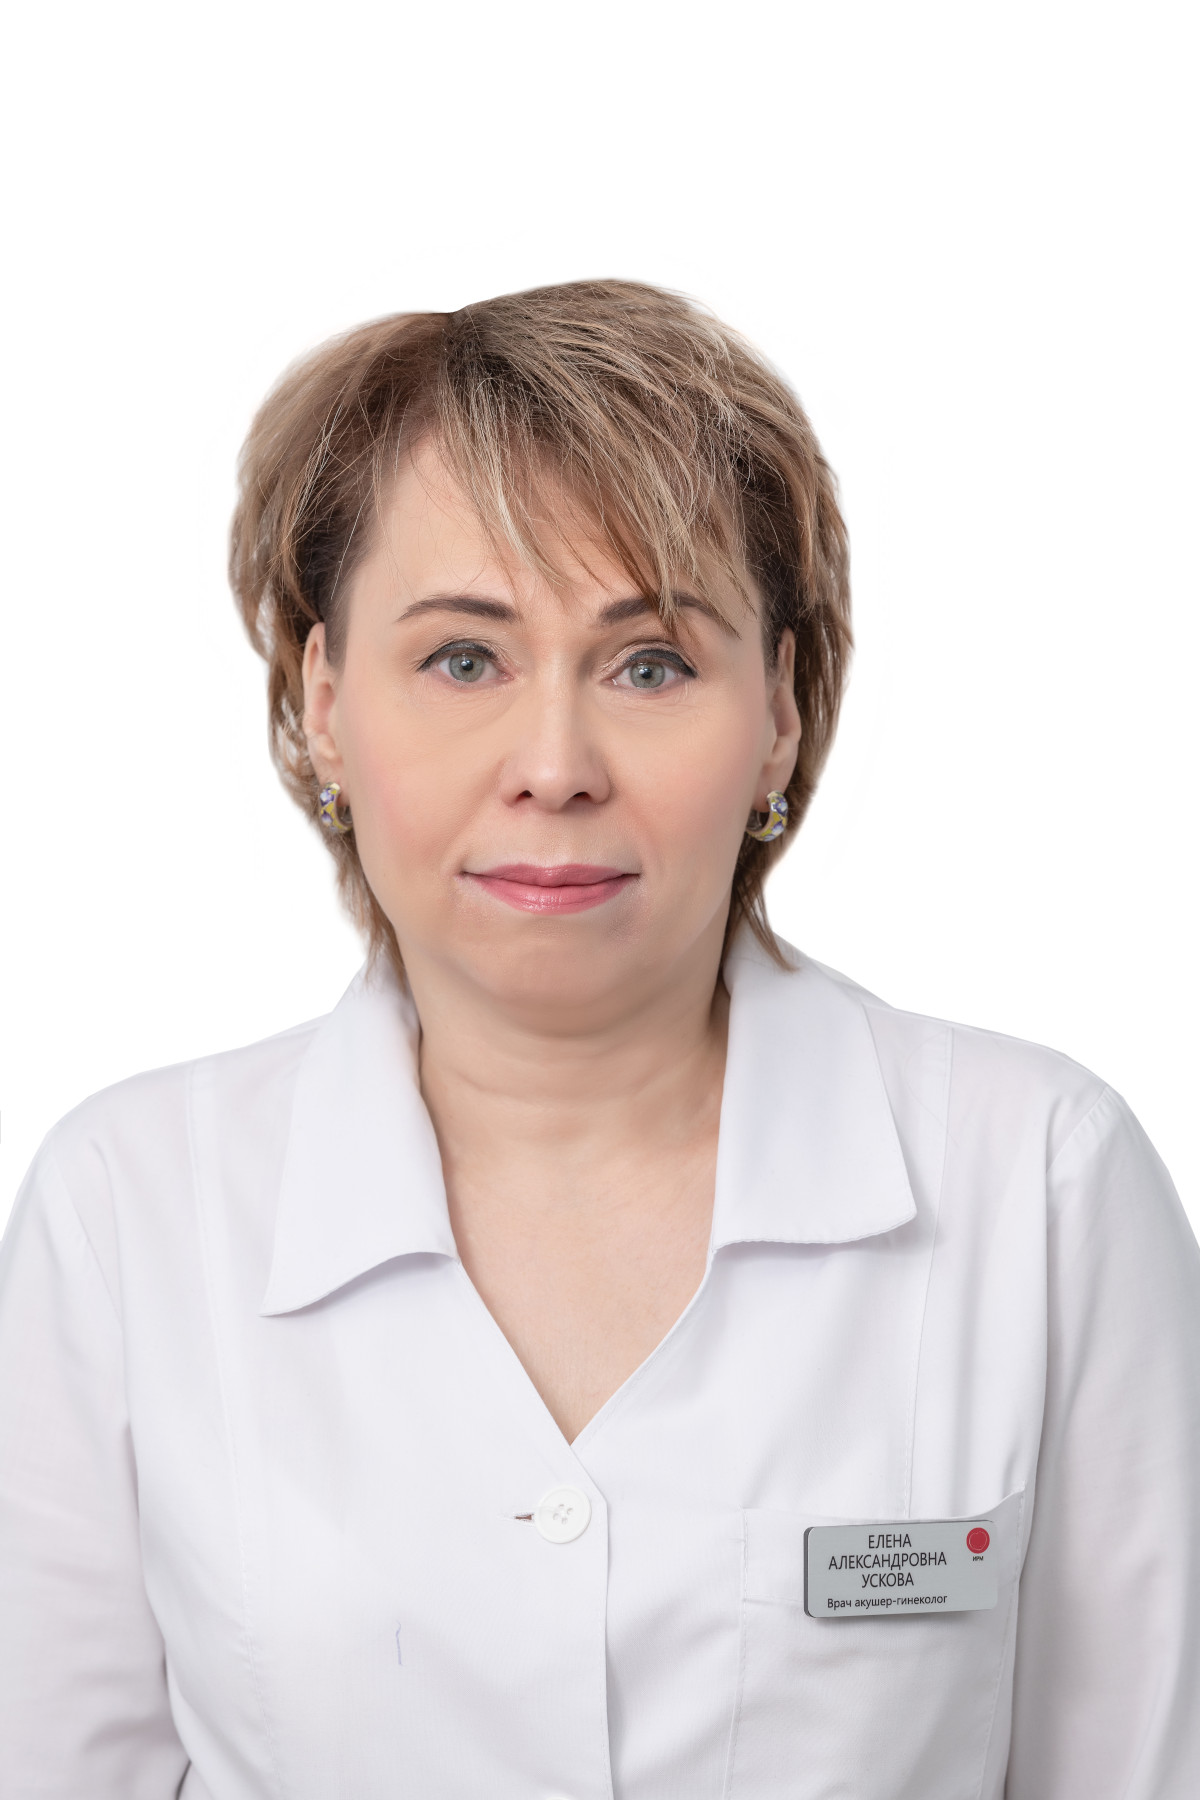 Ускова Елена Александровна фото